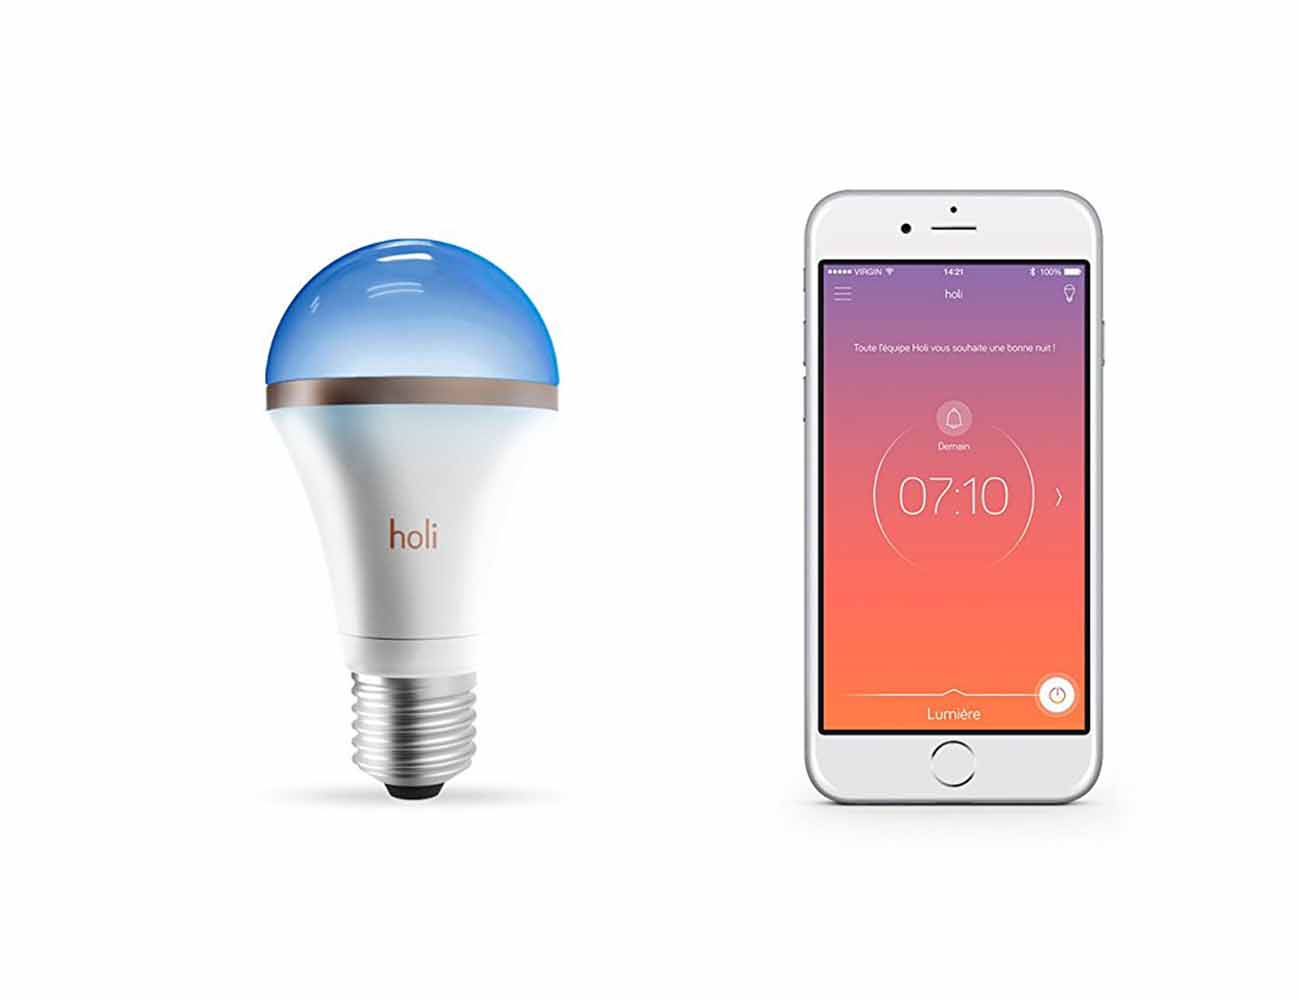 Holî SleepCompanion – The Sleep Enhancing and Monitoring Light